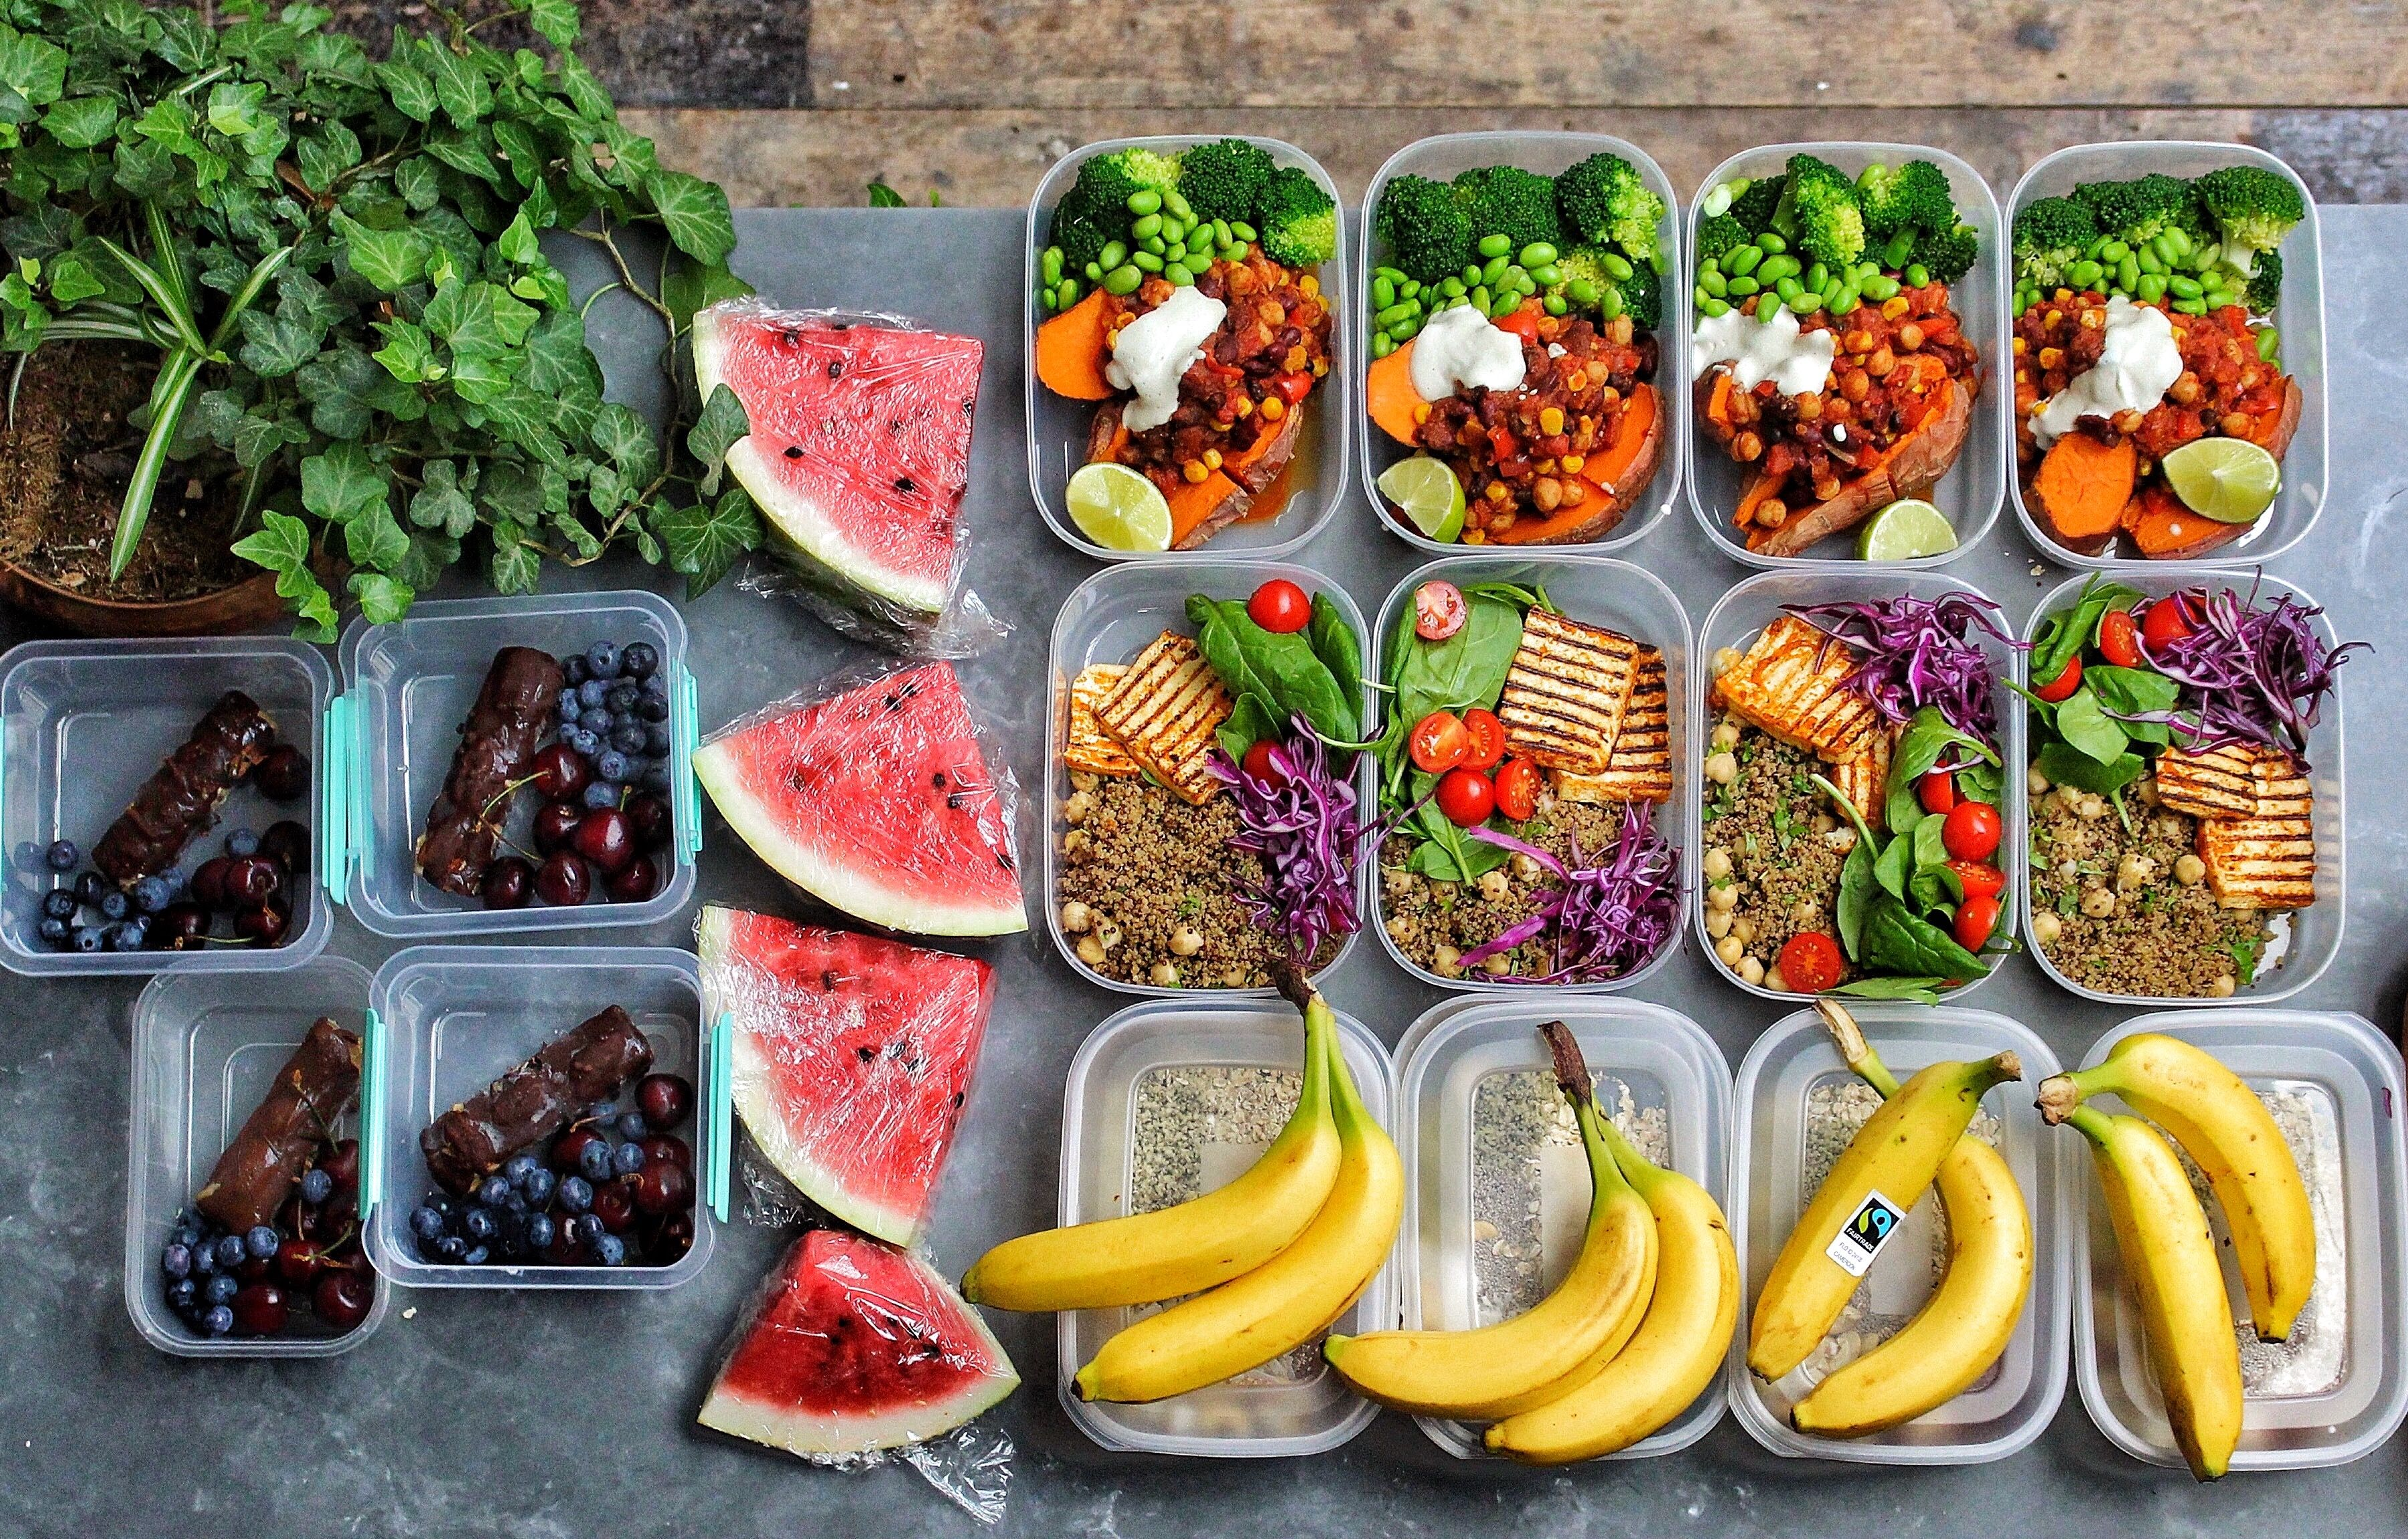 HIGH PROTEIN VEGAN MEAL PREP in 2020 High protein vegan